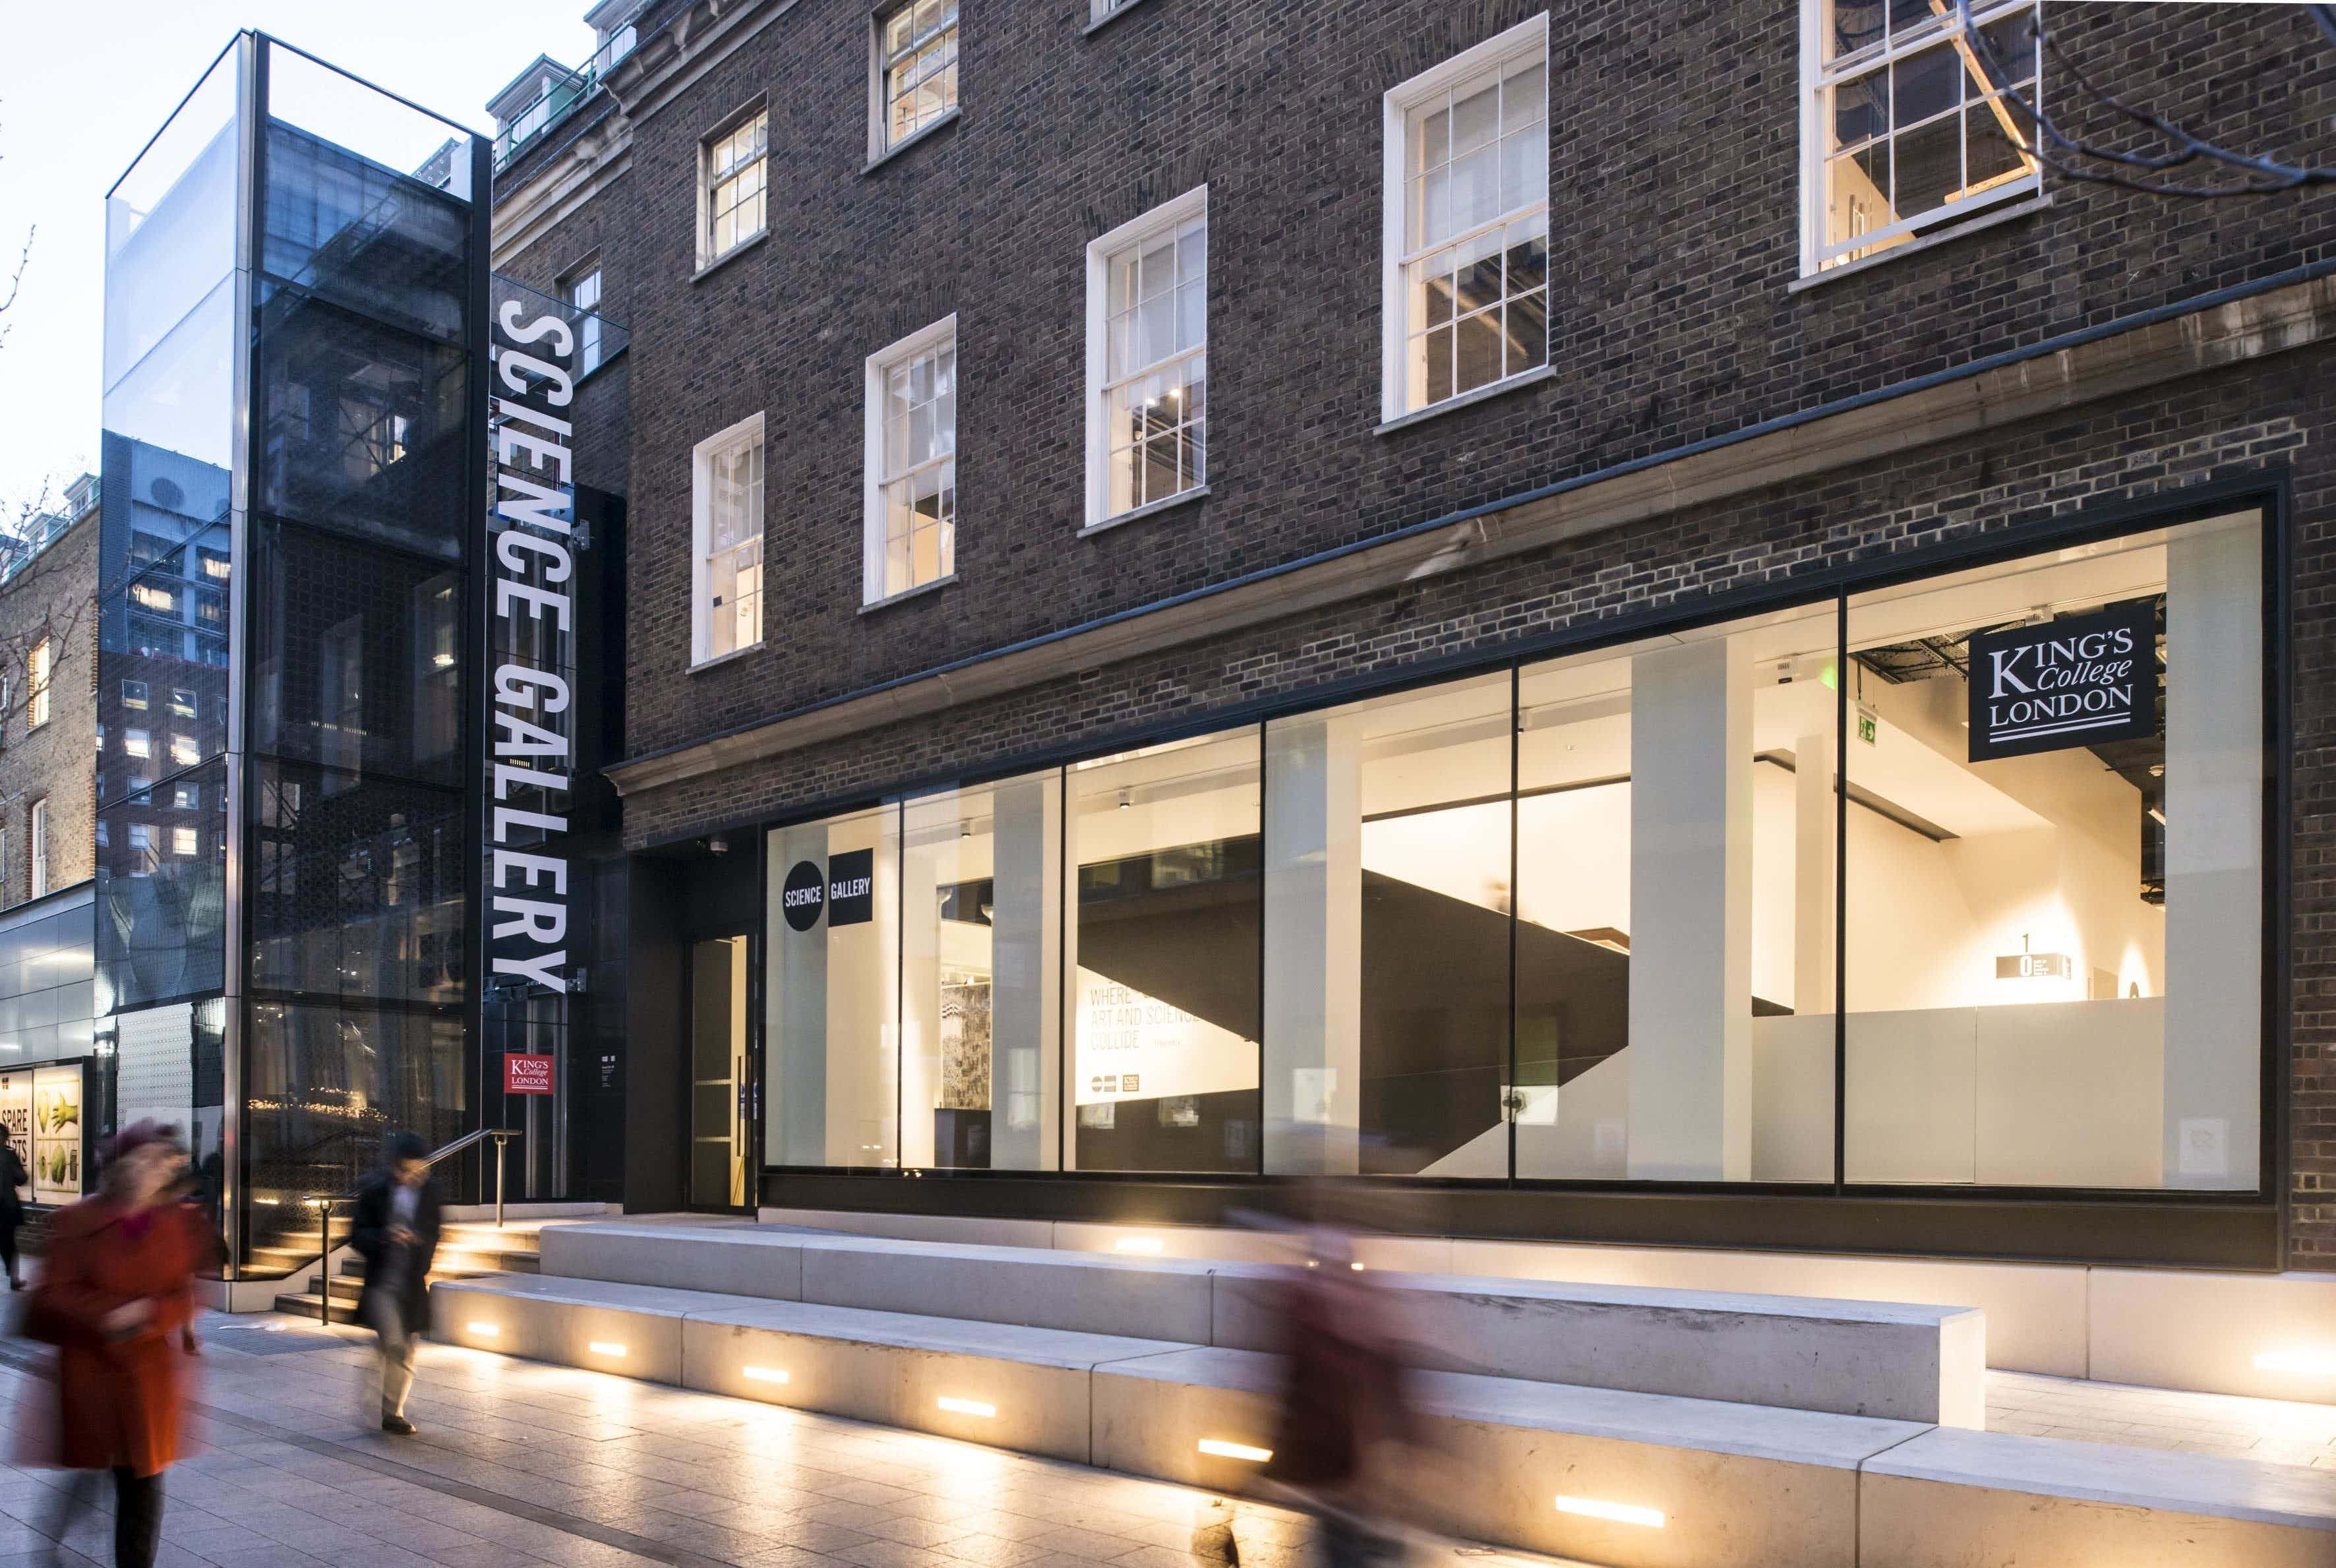 Gallery, Science Gallery London